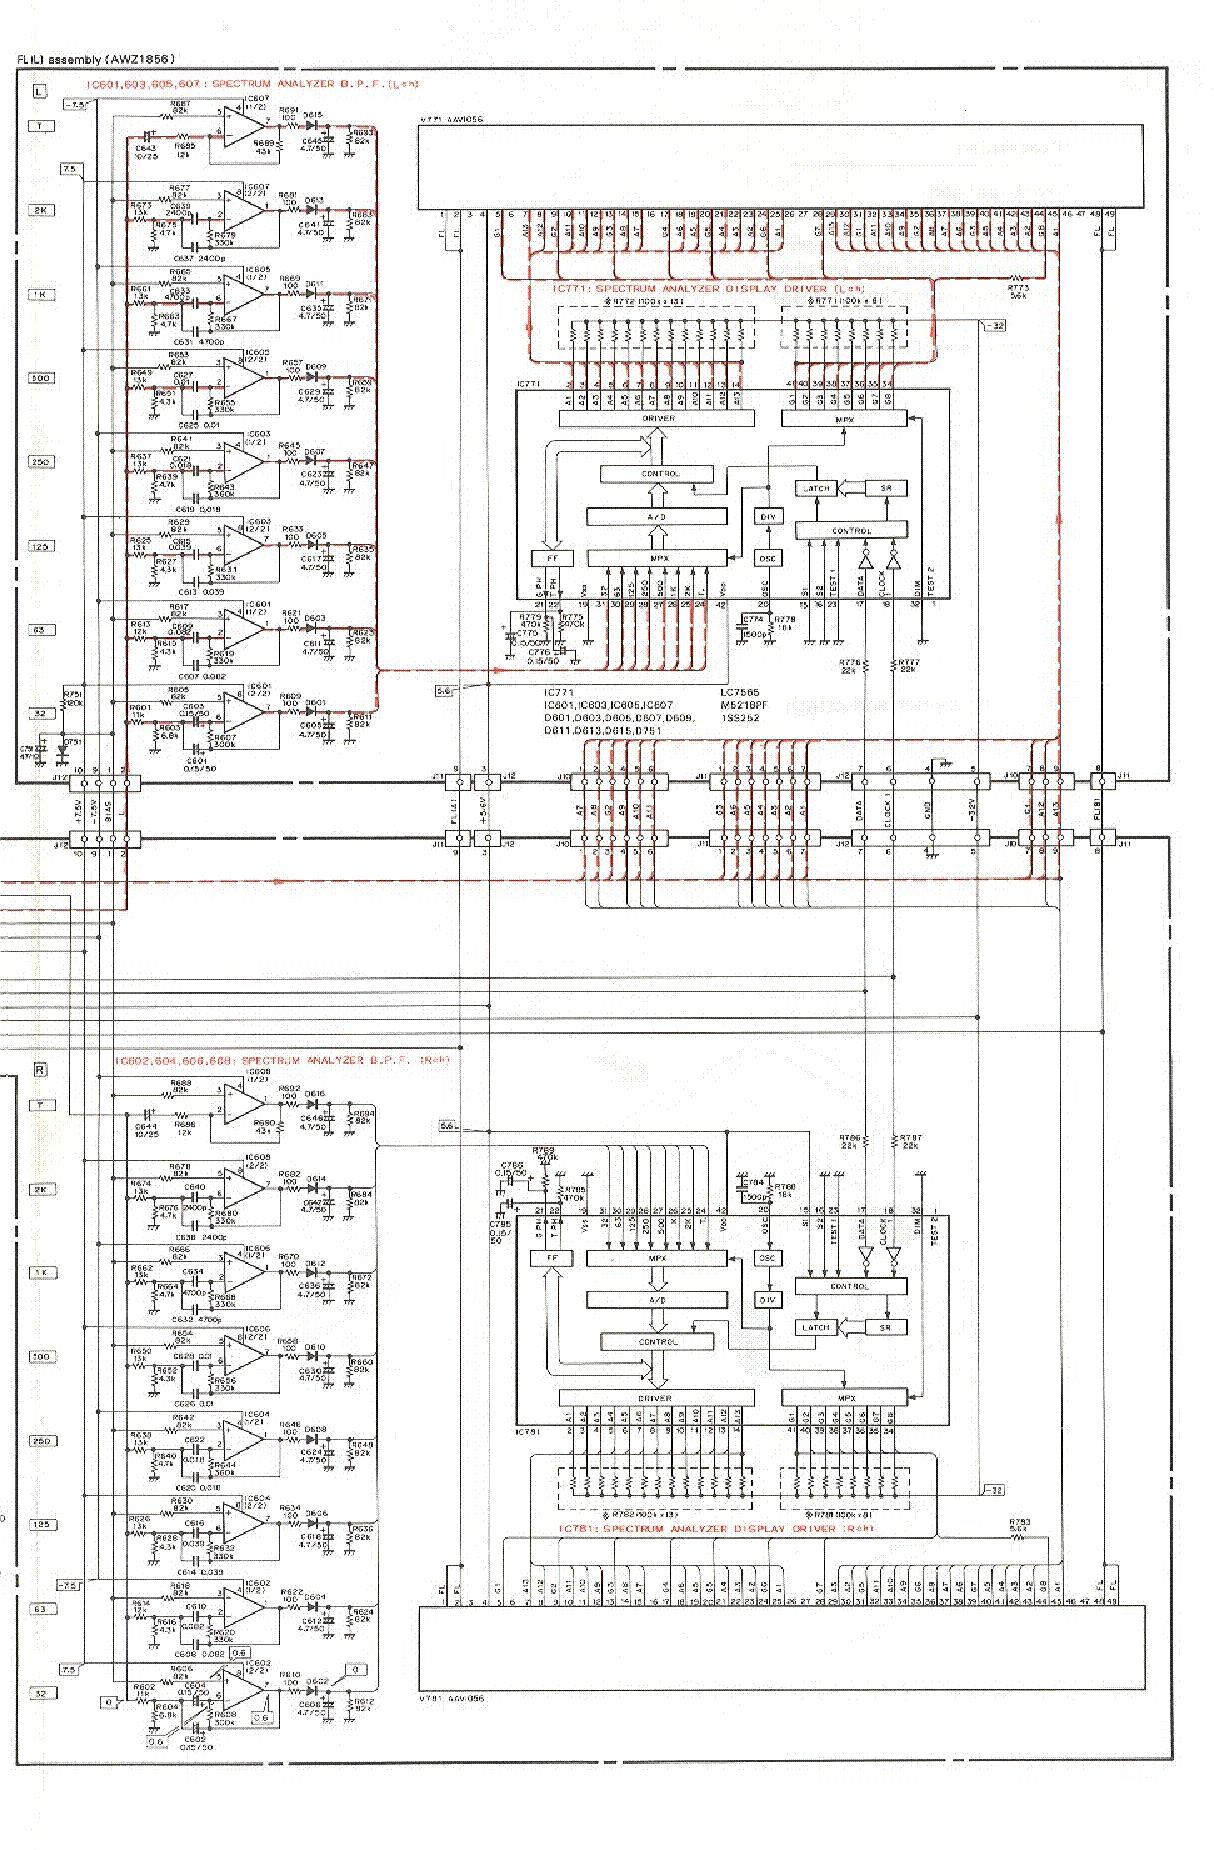 pioneer gr 777 sch service manual download schematics eeprom rh elektrotanya com ecualizador pioneer gr 777 manual ecualizador pioneer gr 777 manual